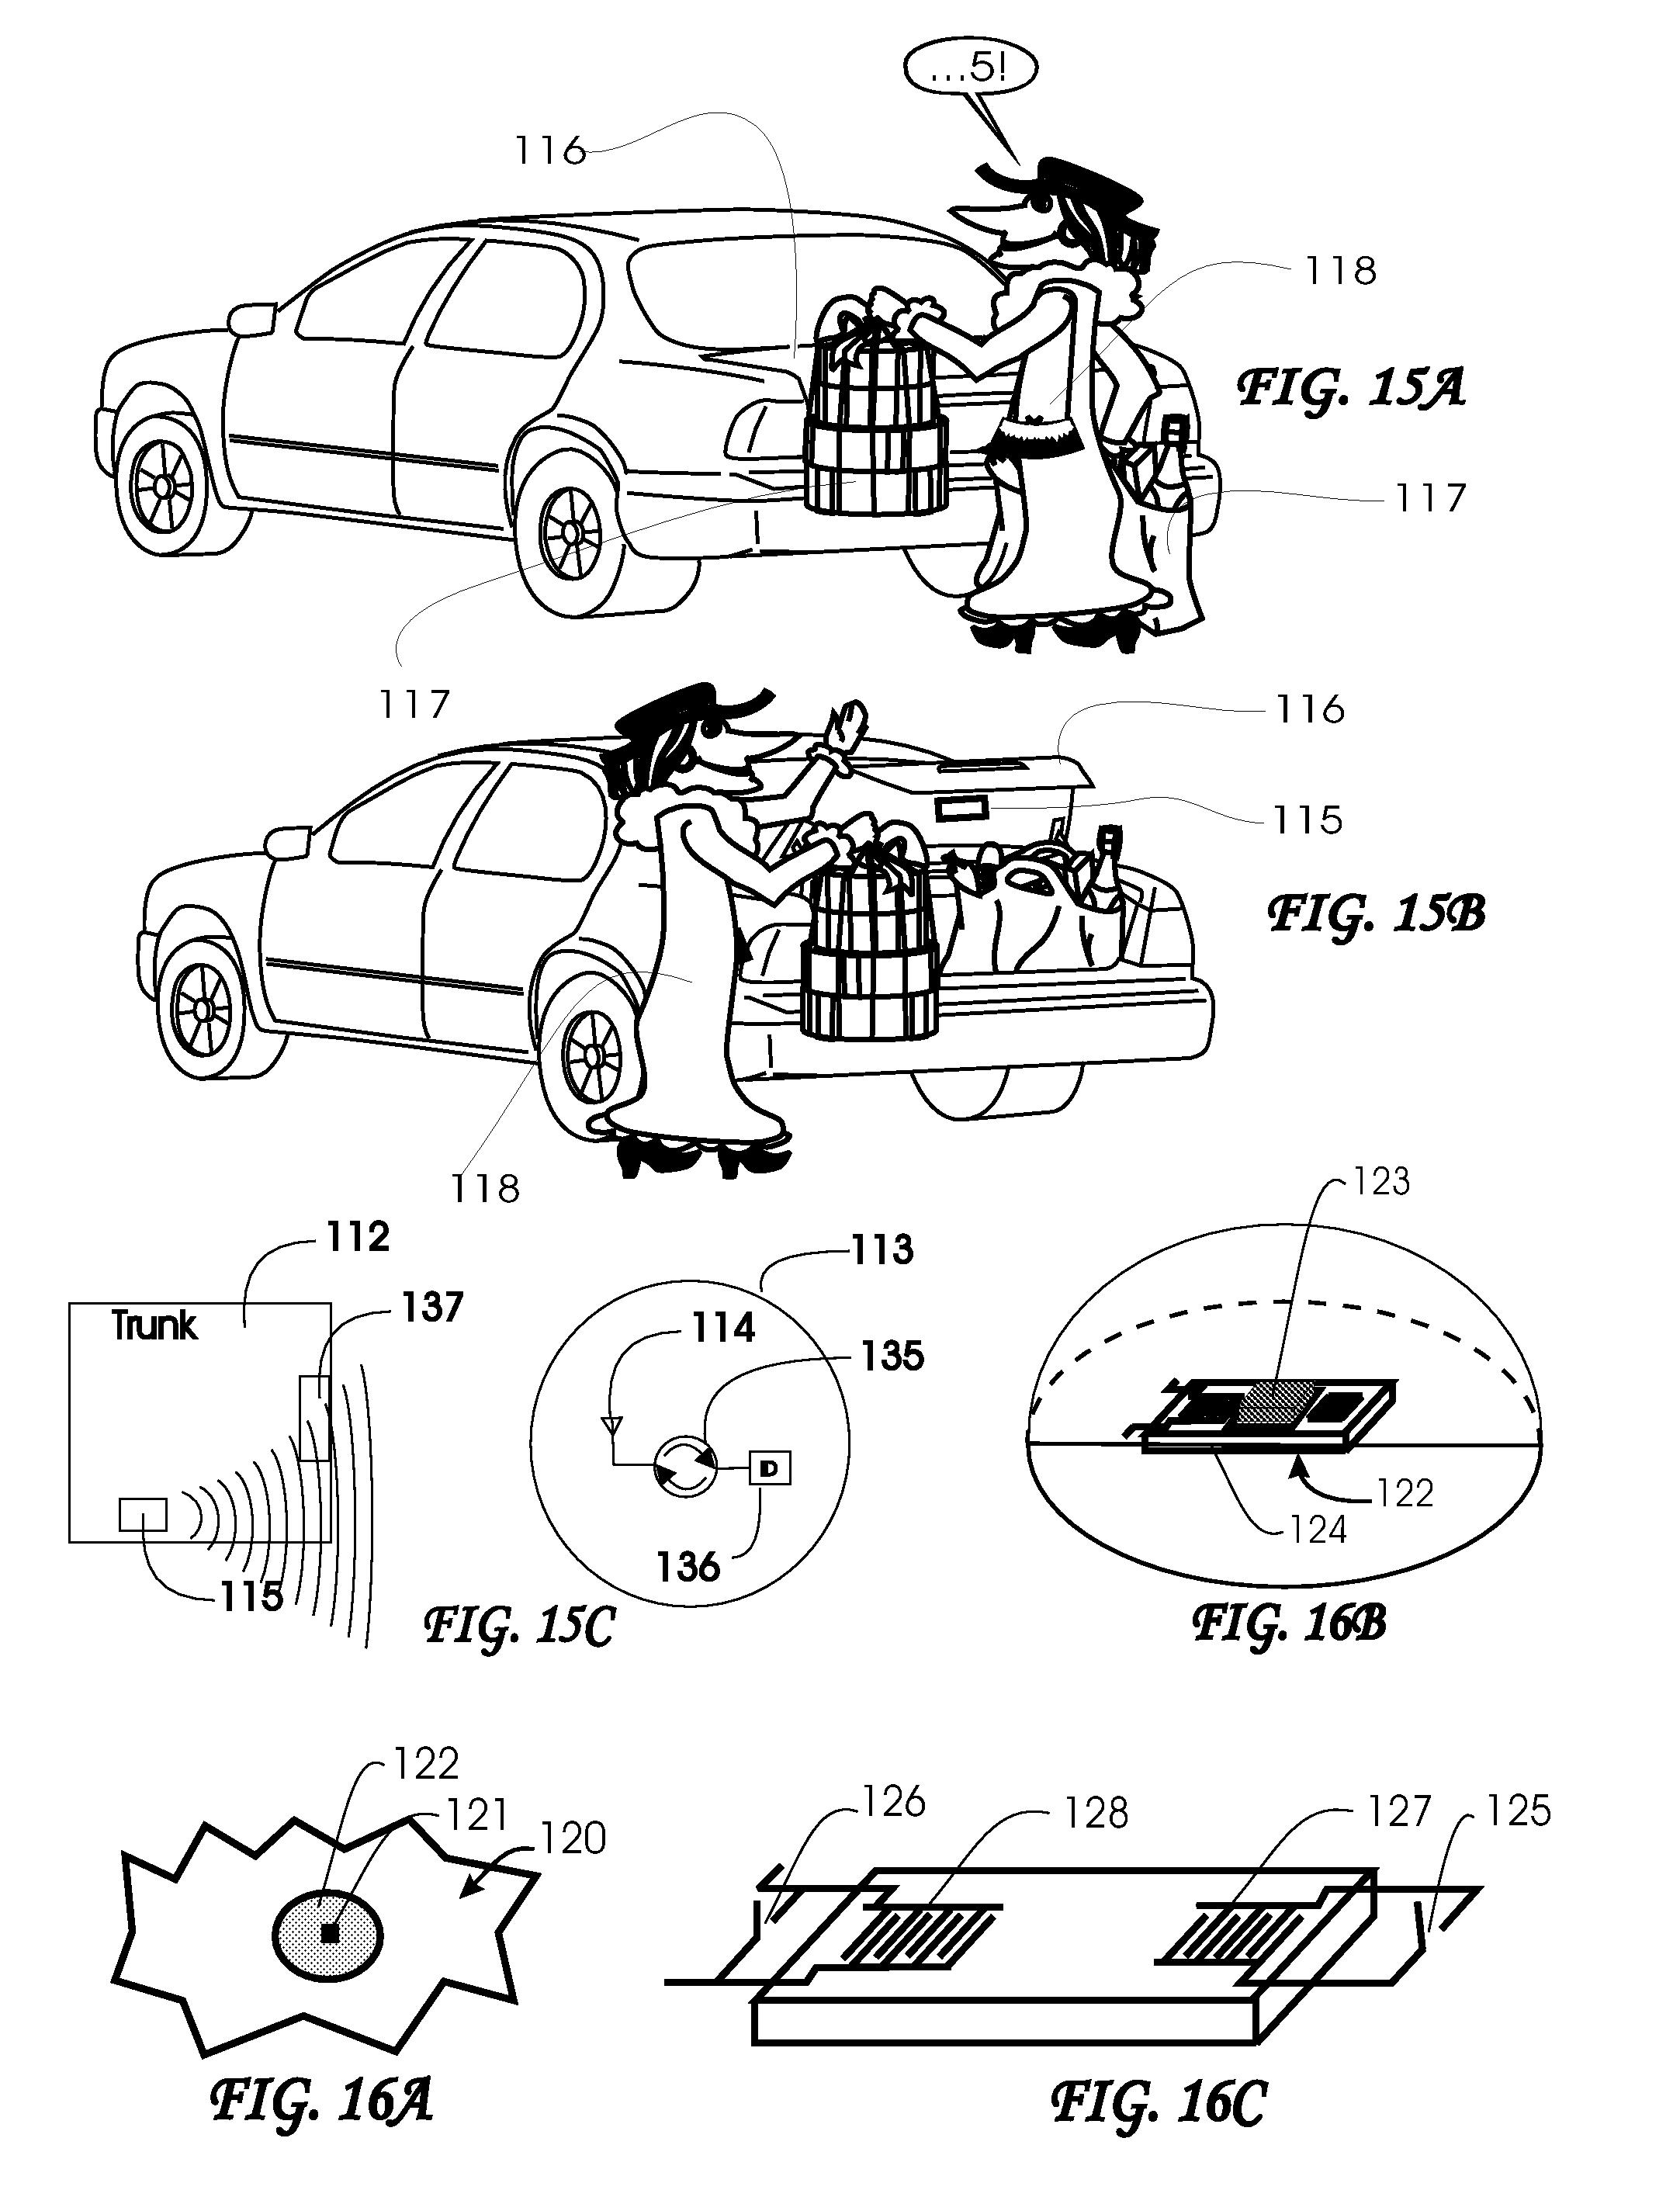 96 Suburban Wiring Diagram, 96, Get Free Image About